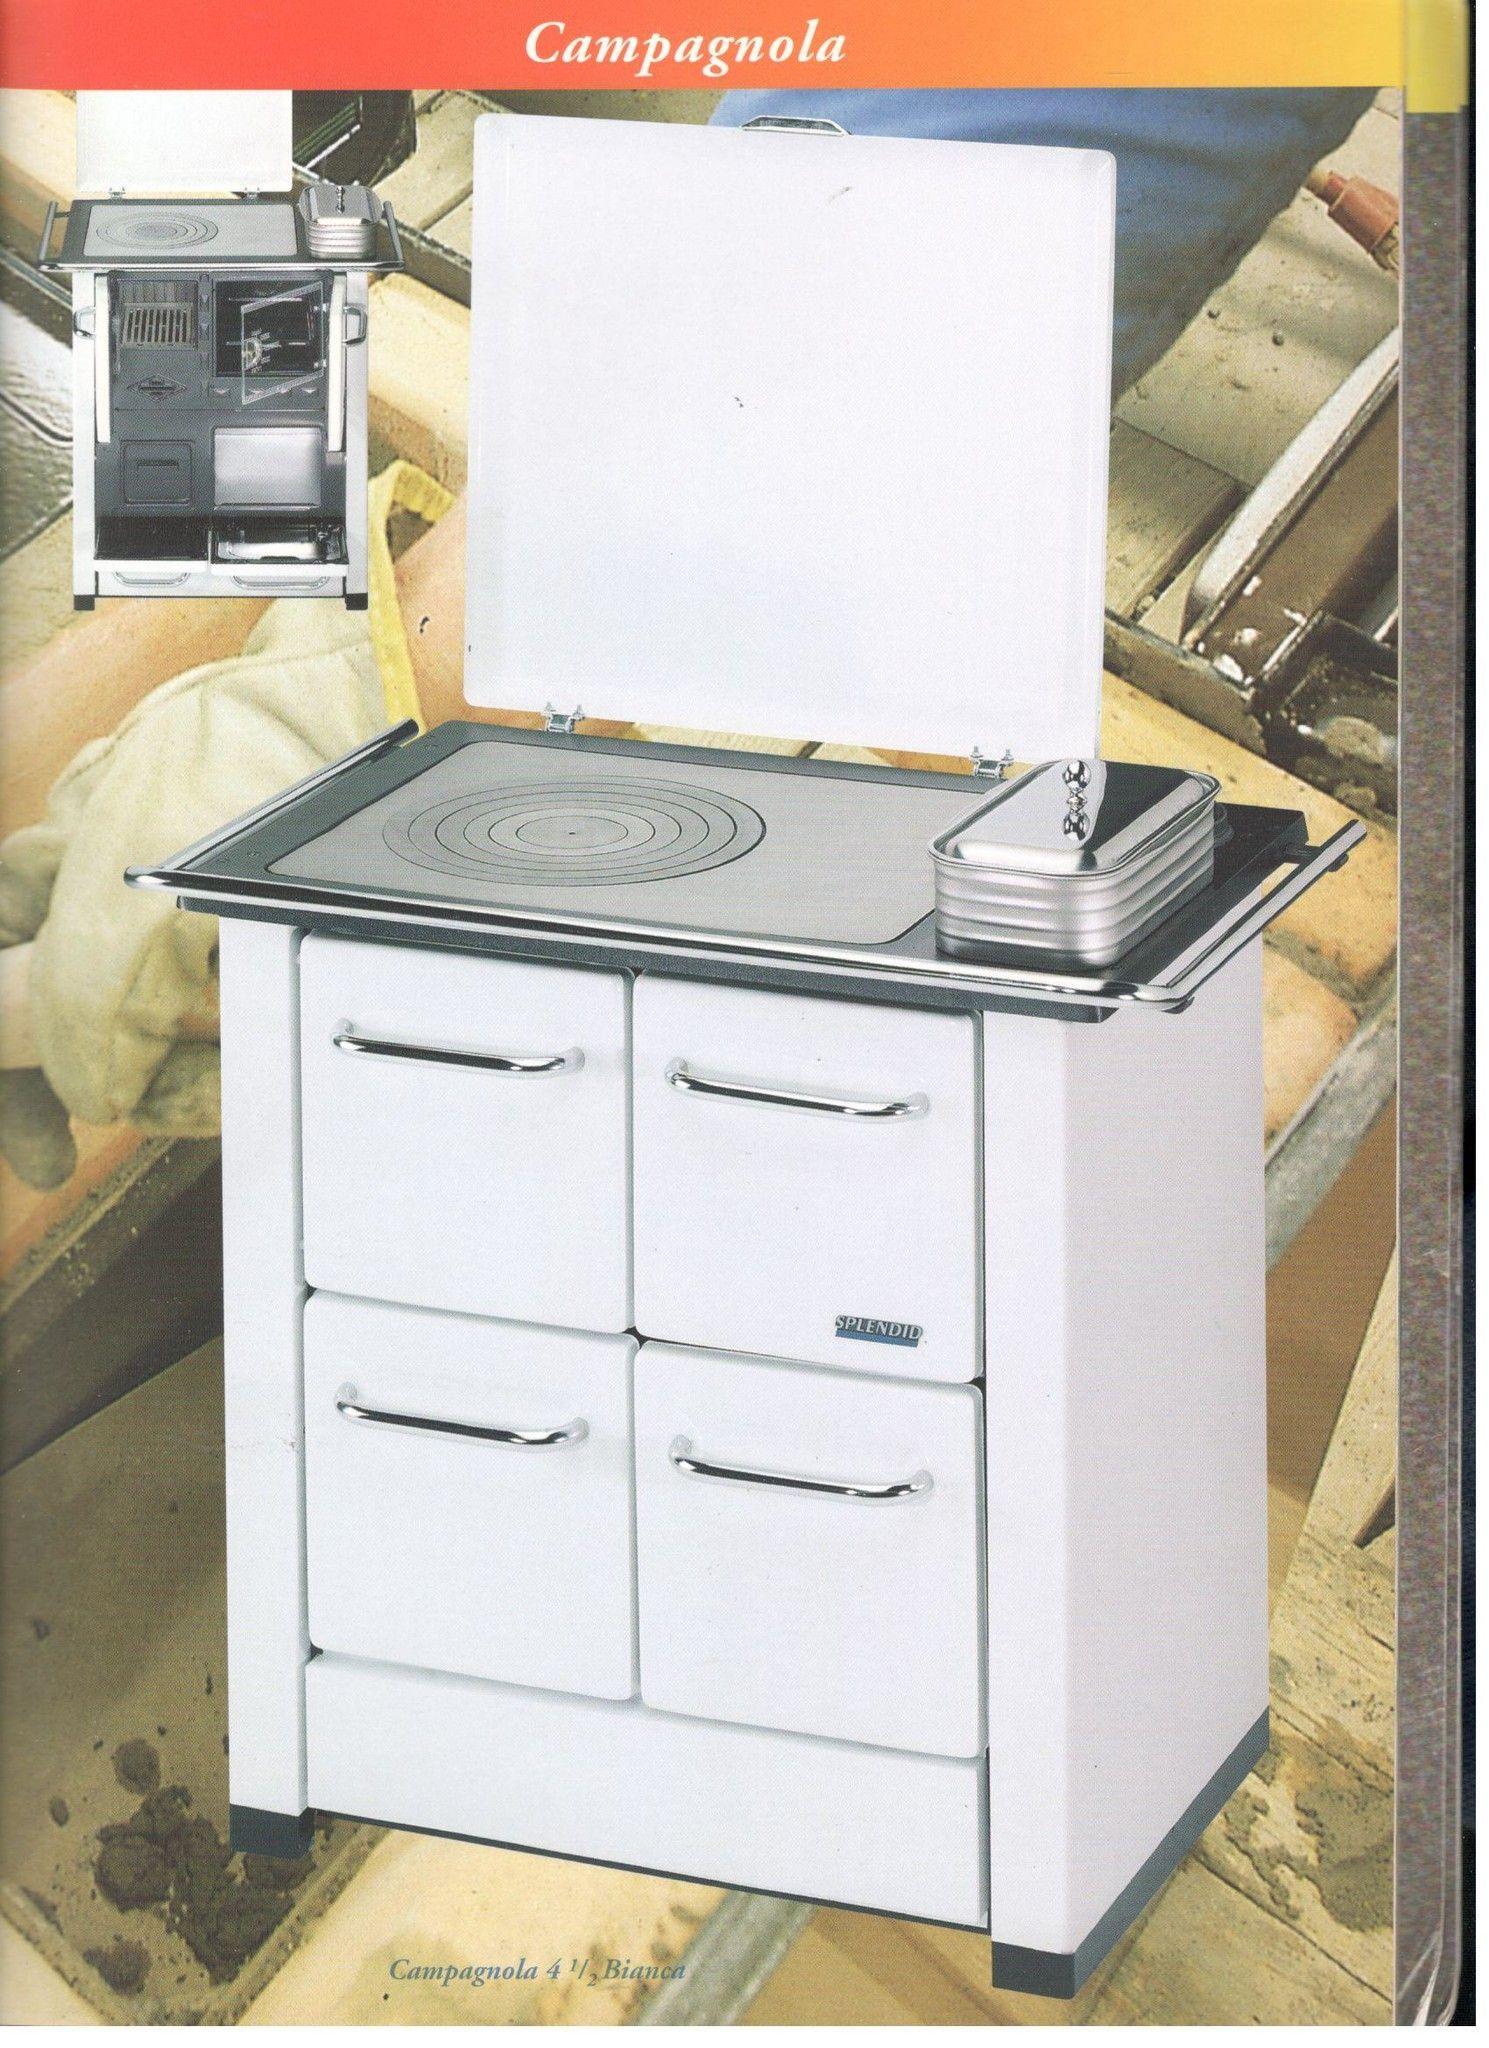 Cucina Economica Splendid 4 1 2 Mod Campagnola Colre Bianco Vari E Occasioni Occasioni Shop Online Berni Ferramenta Vr